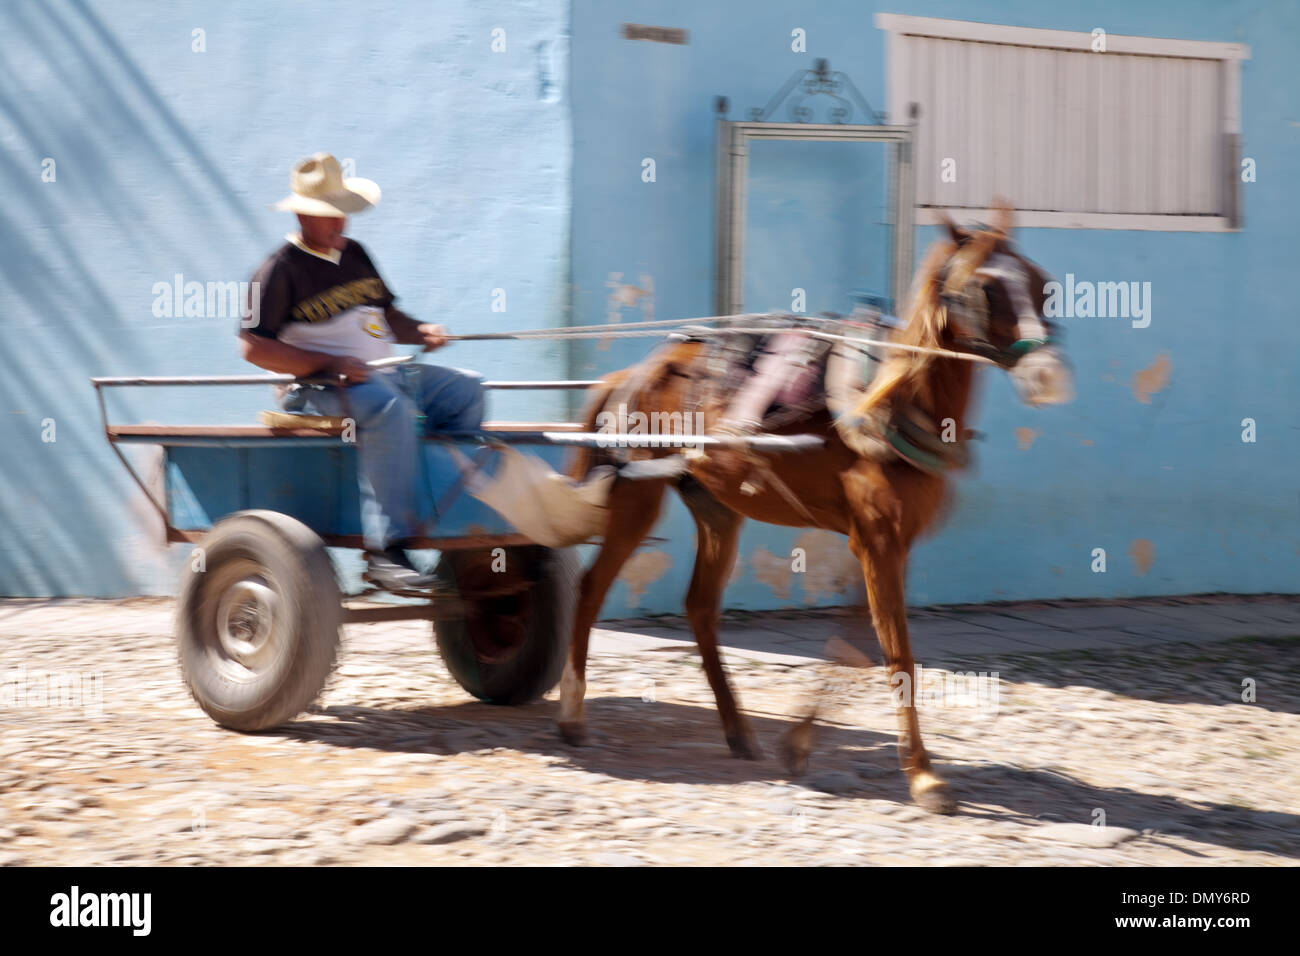 Trinidad, Kuba, Pferd und Wagen Transport mit Motion blur, Kuba, Caribbean Stockbild